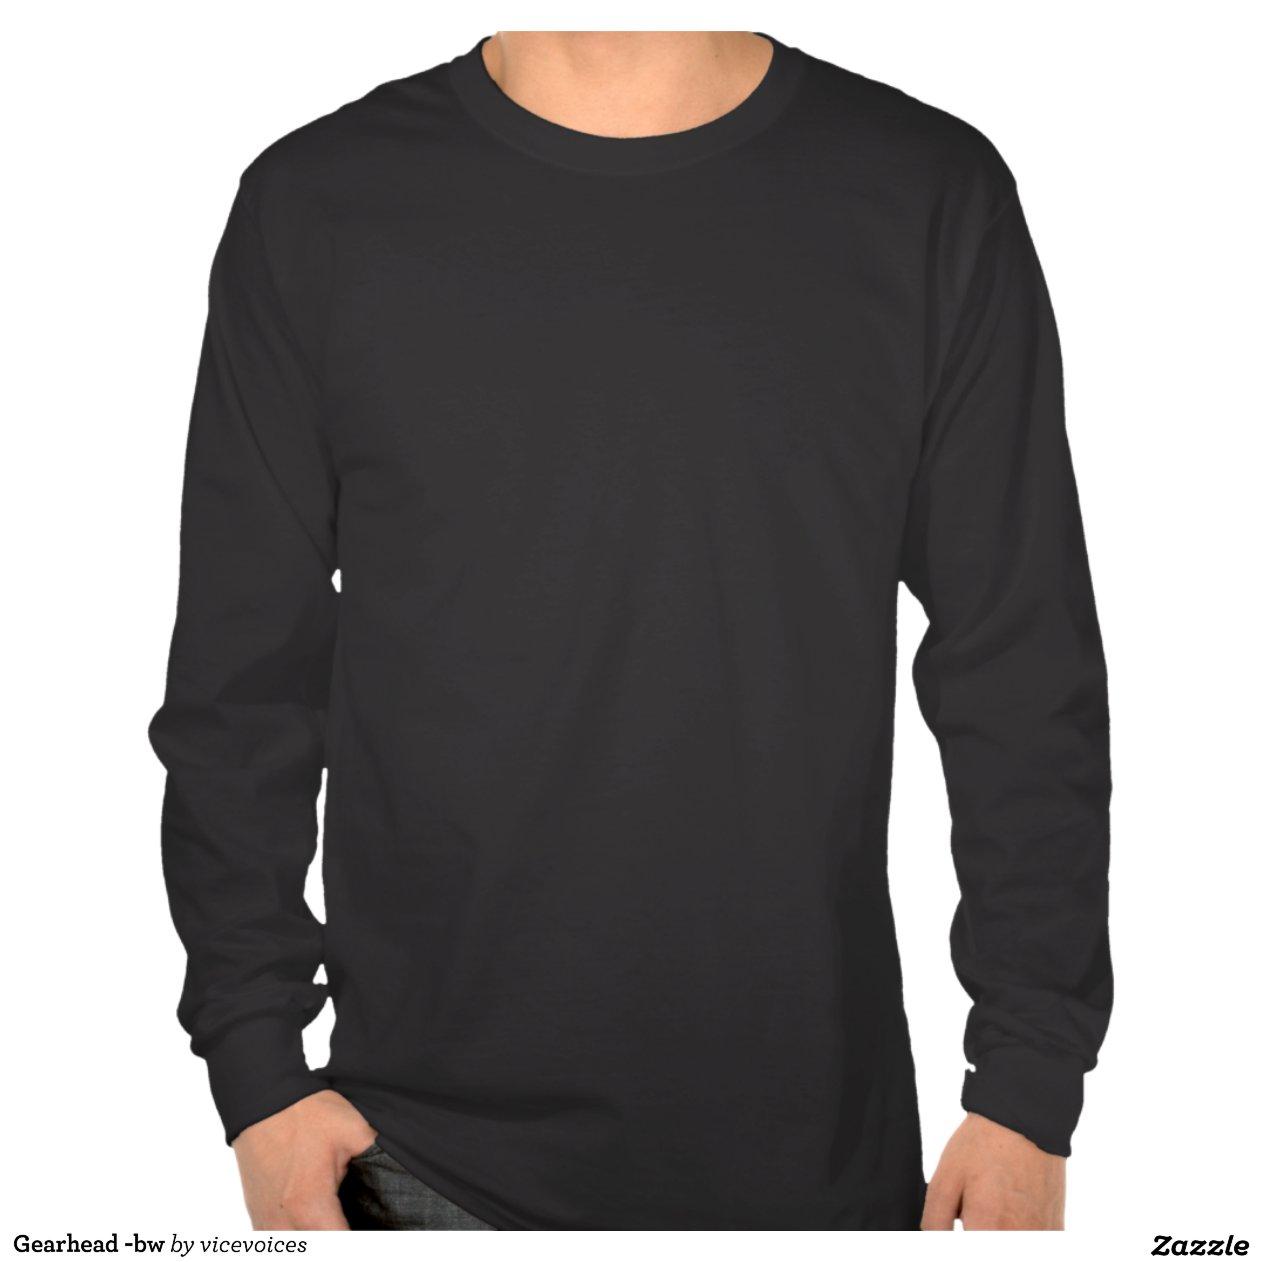 Gearhead T Shirts Gearhead Bw Shirts Raccefdbefa Naxf